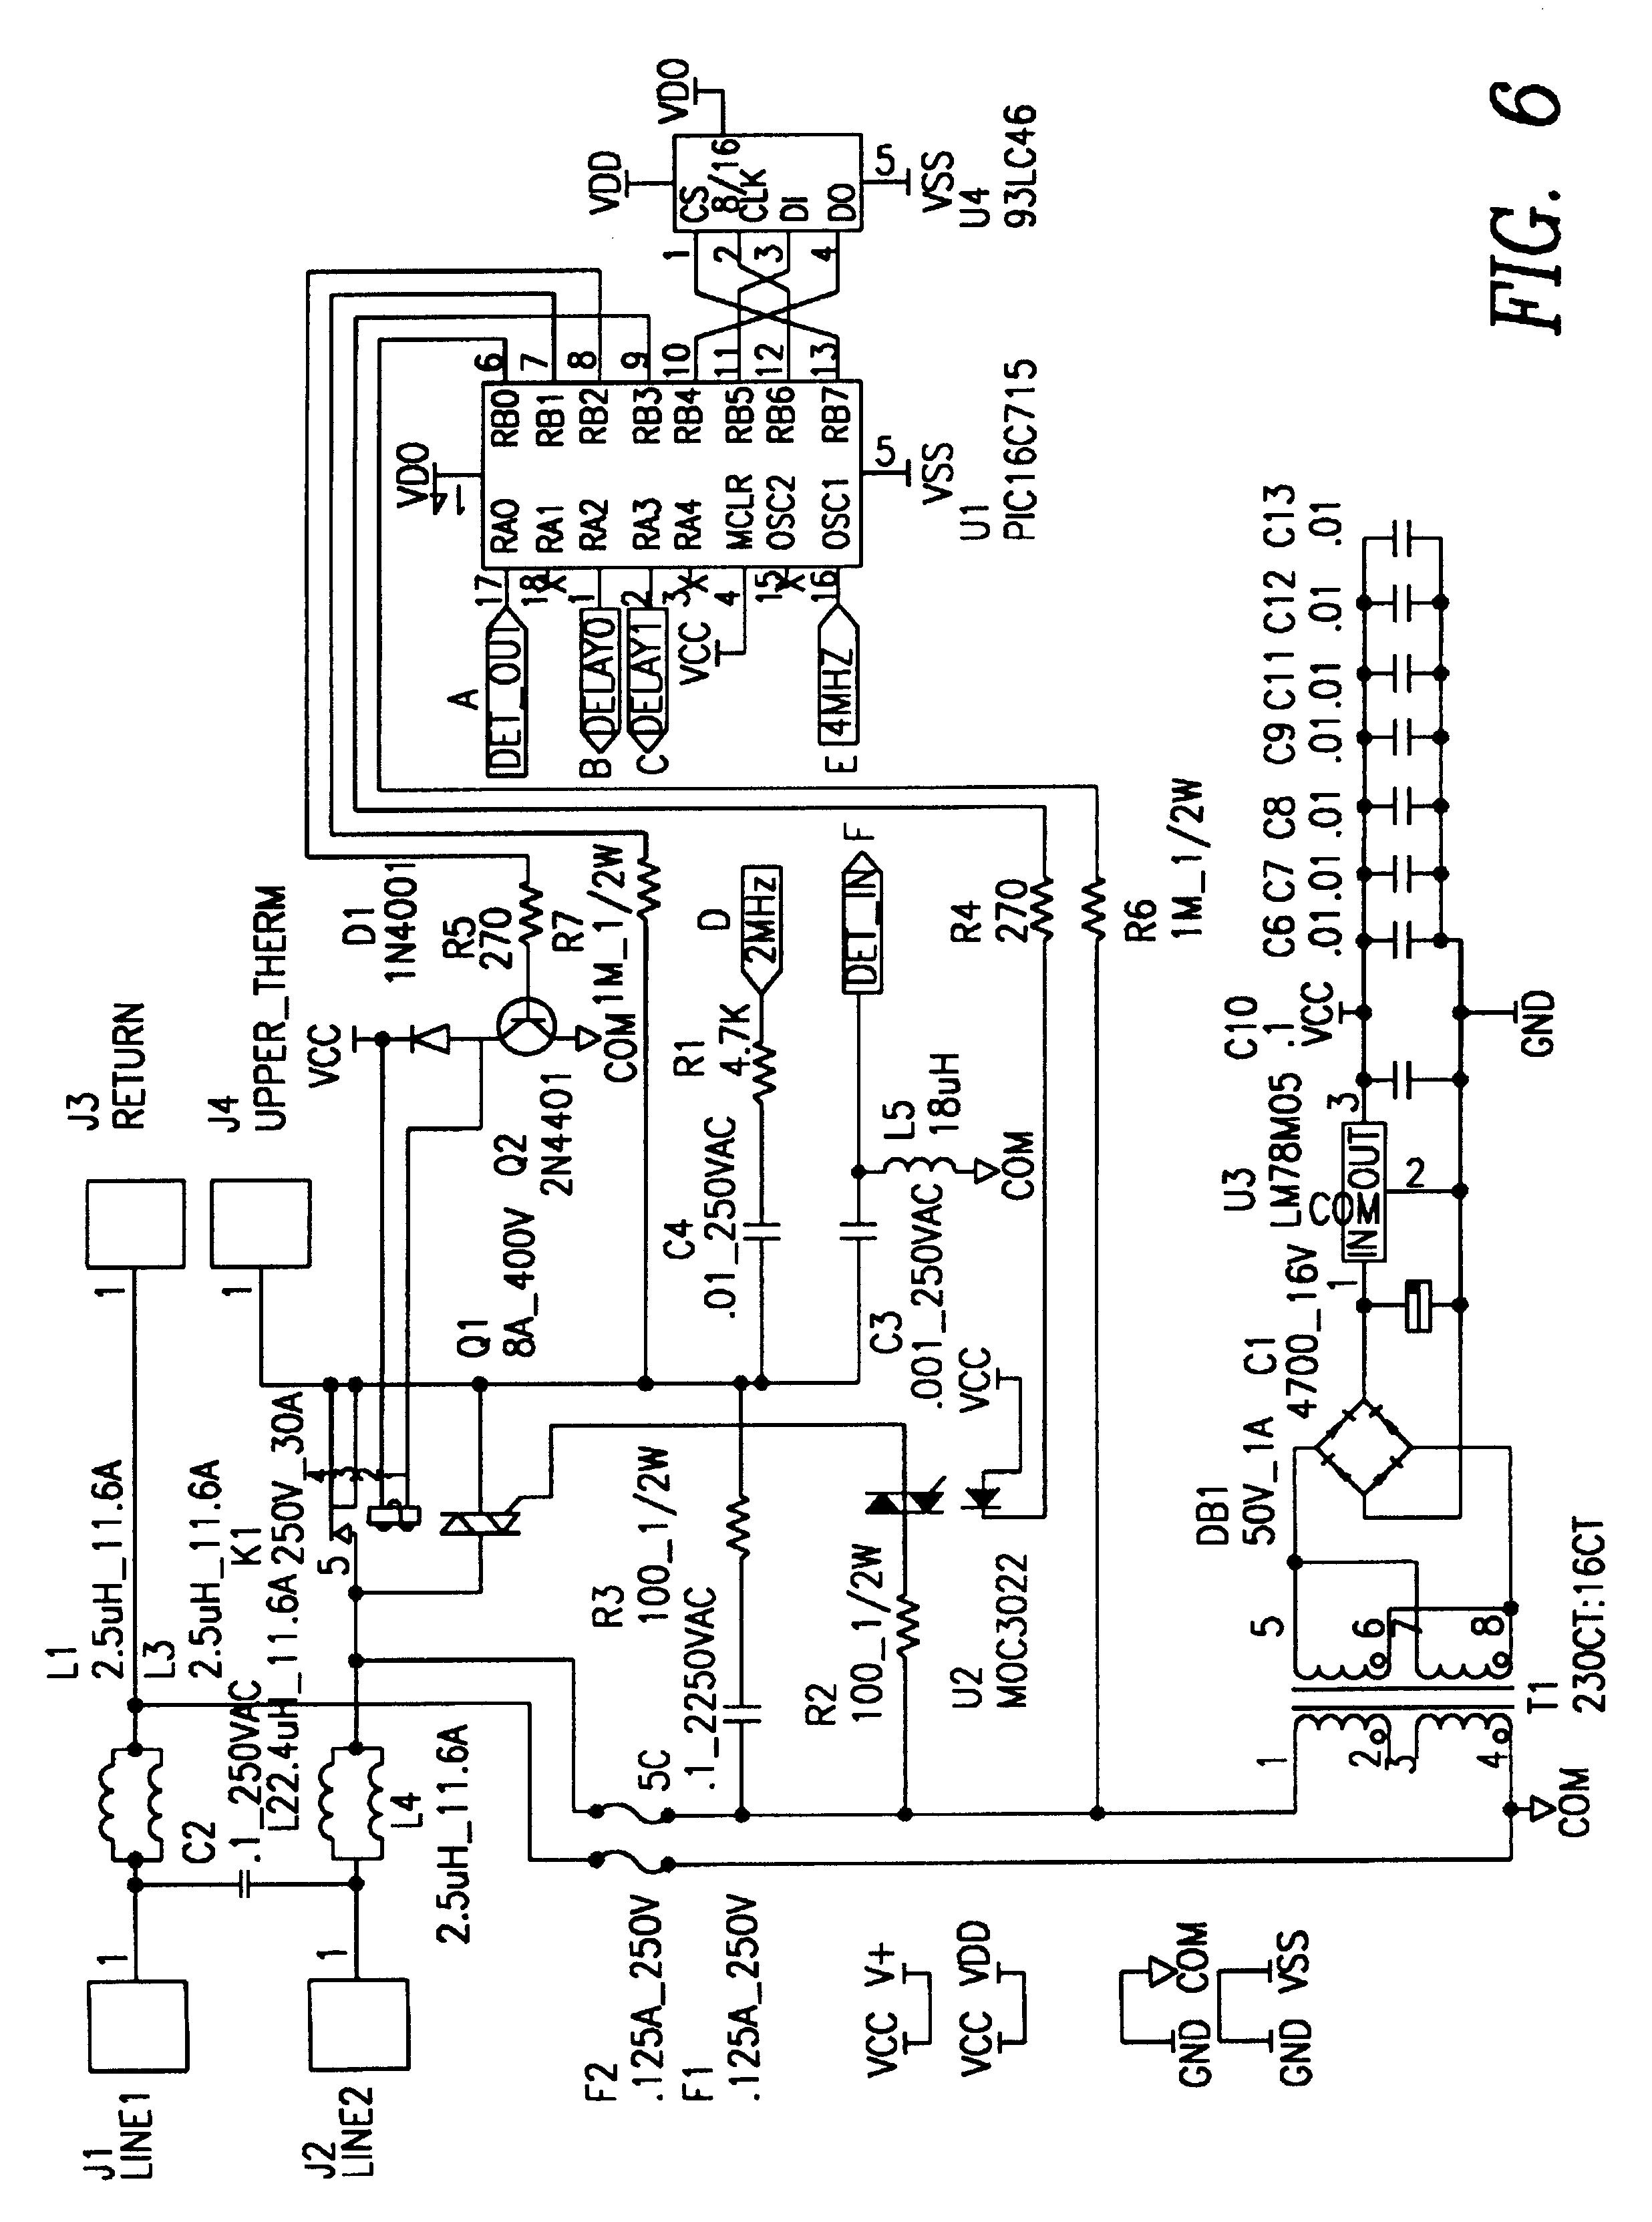 hatco booster heater wiring diagram 35 wiring diagram hatco food warmer  wiring diagram hatco warmer wiring diagram